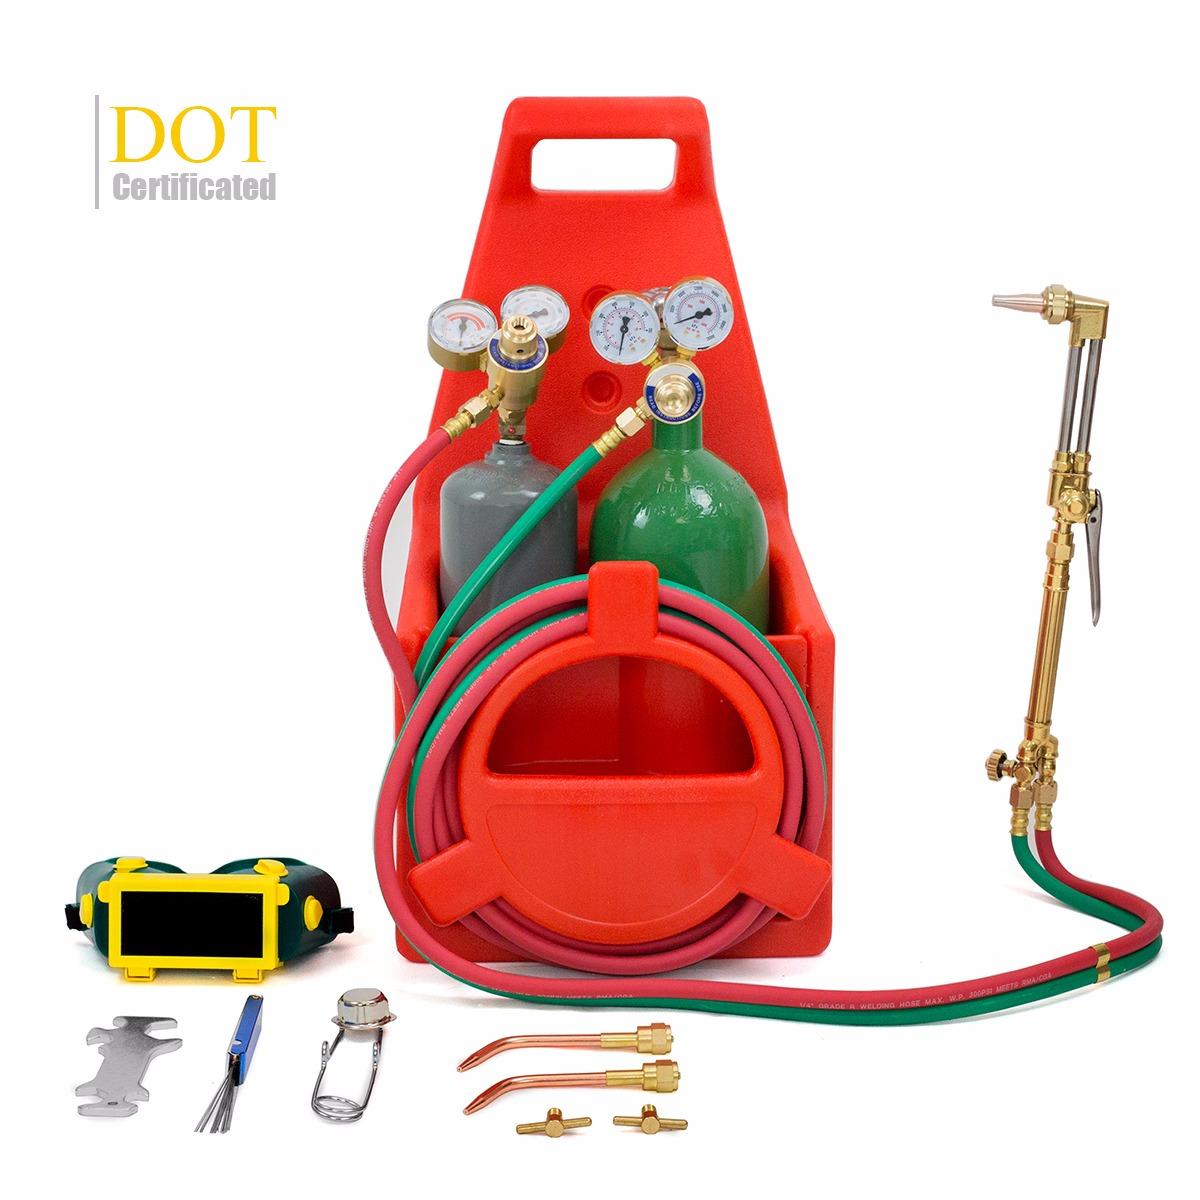 DOT Tote Oxygen Acetylene Oxy Welding Cutting Torch Kit